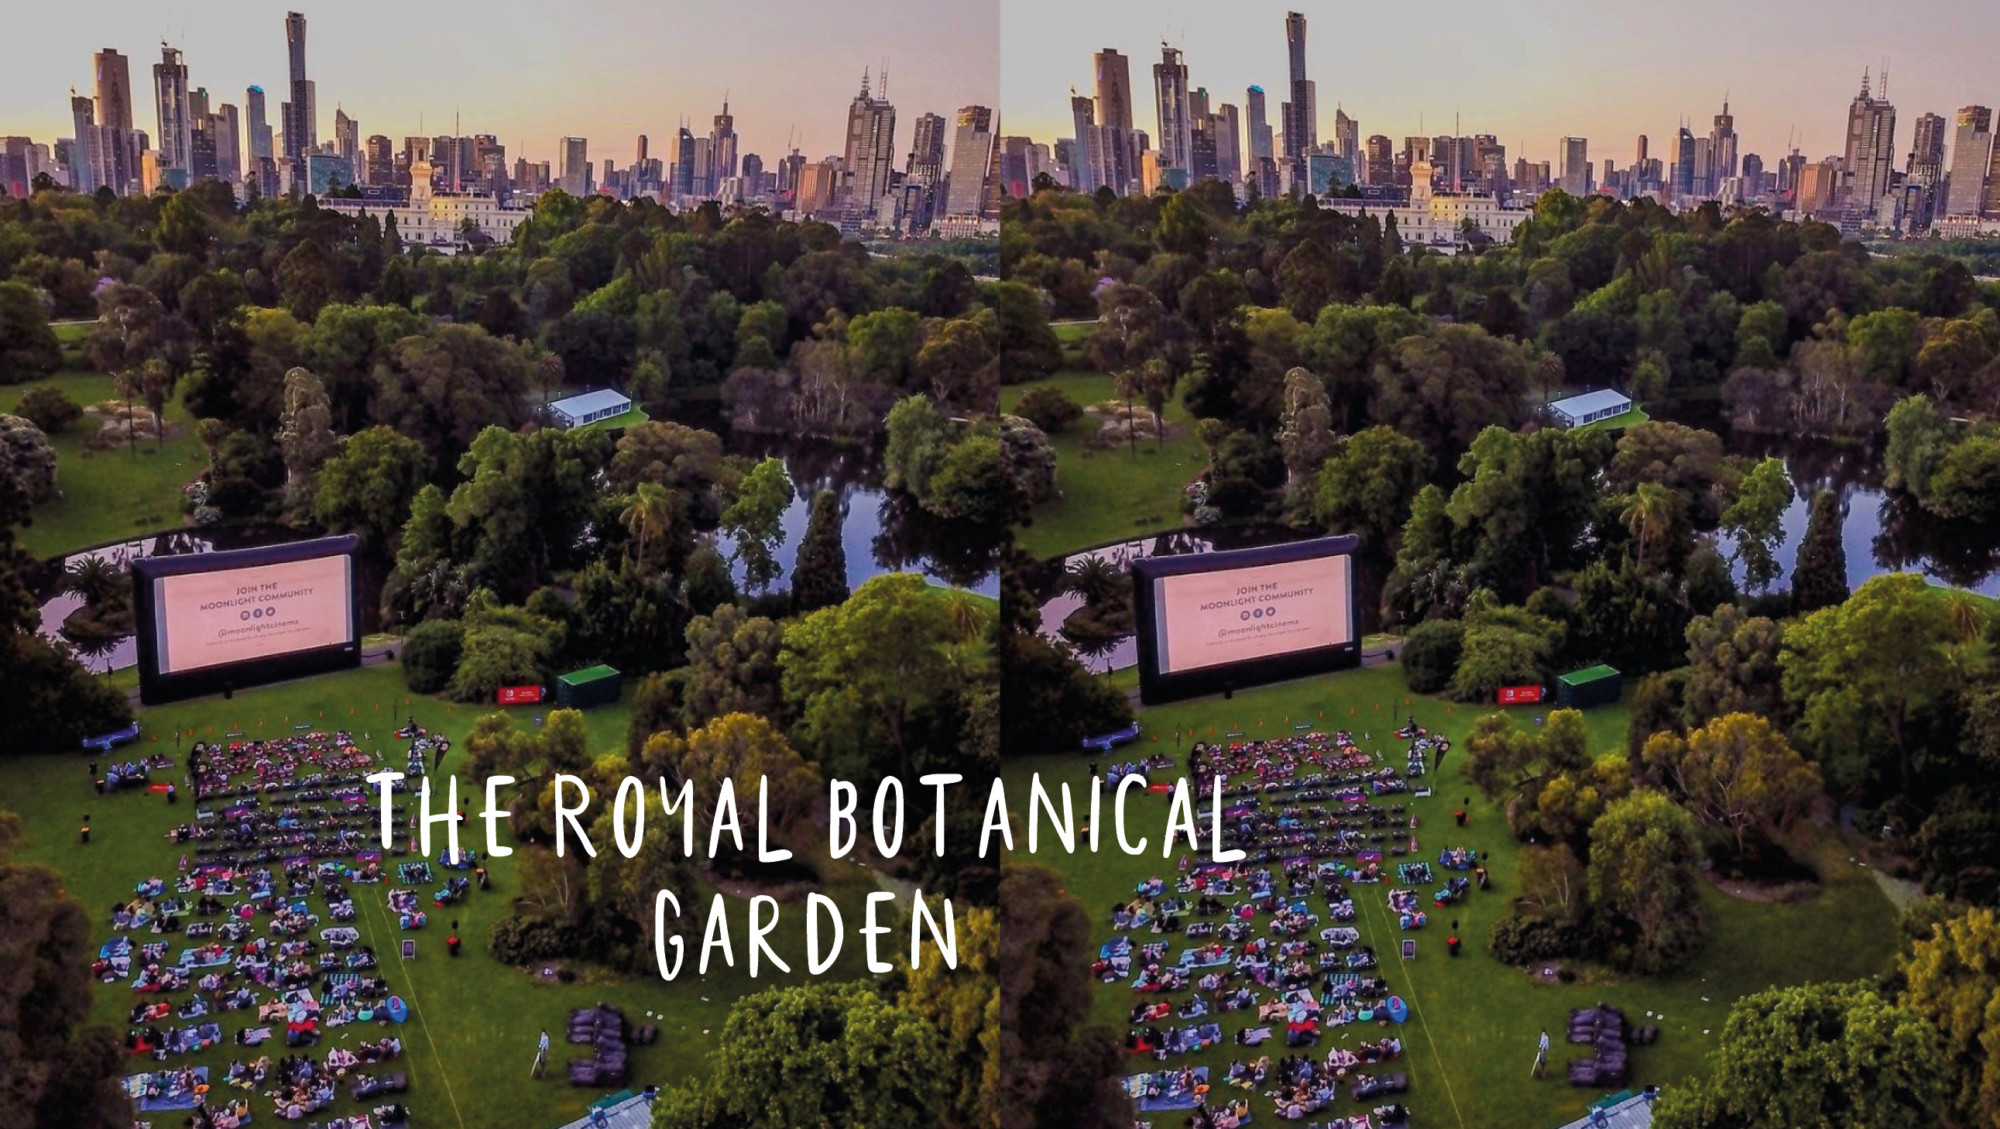 royal botanical garden met moonlight cinema in melbourne australia